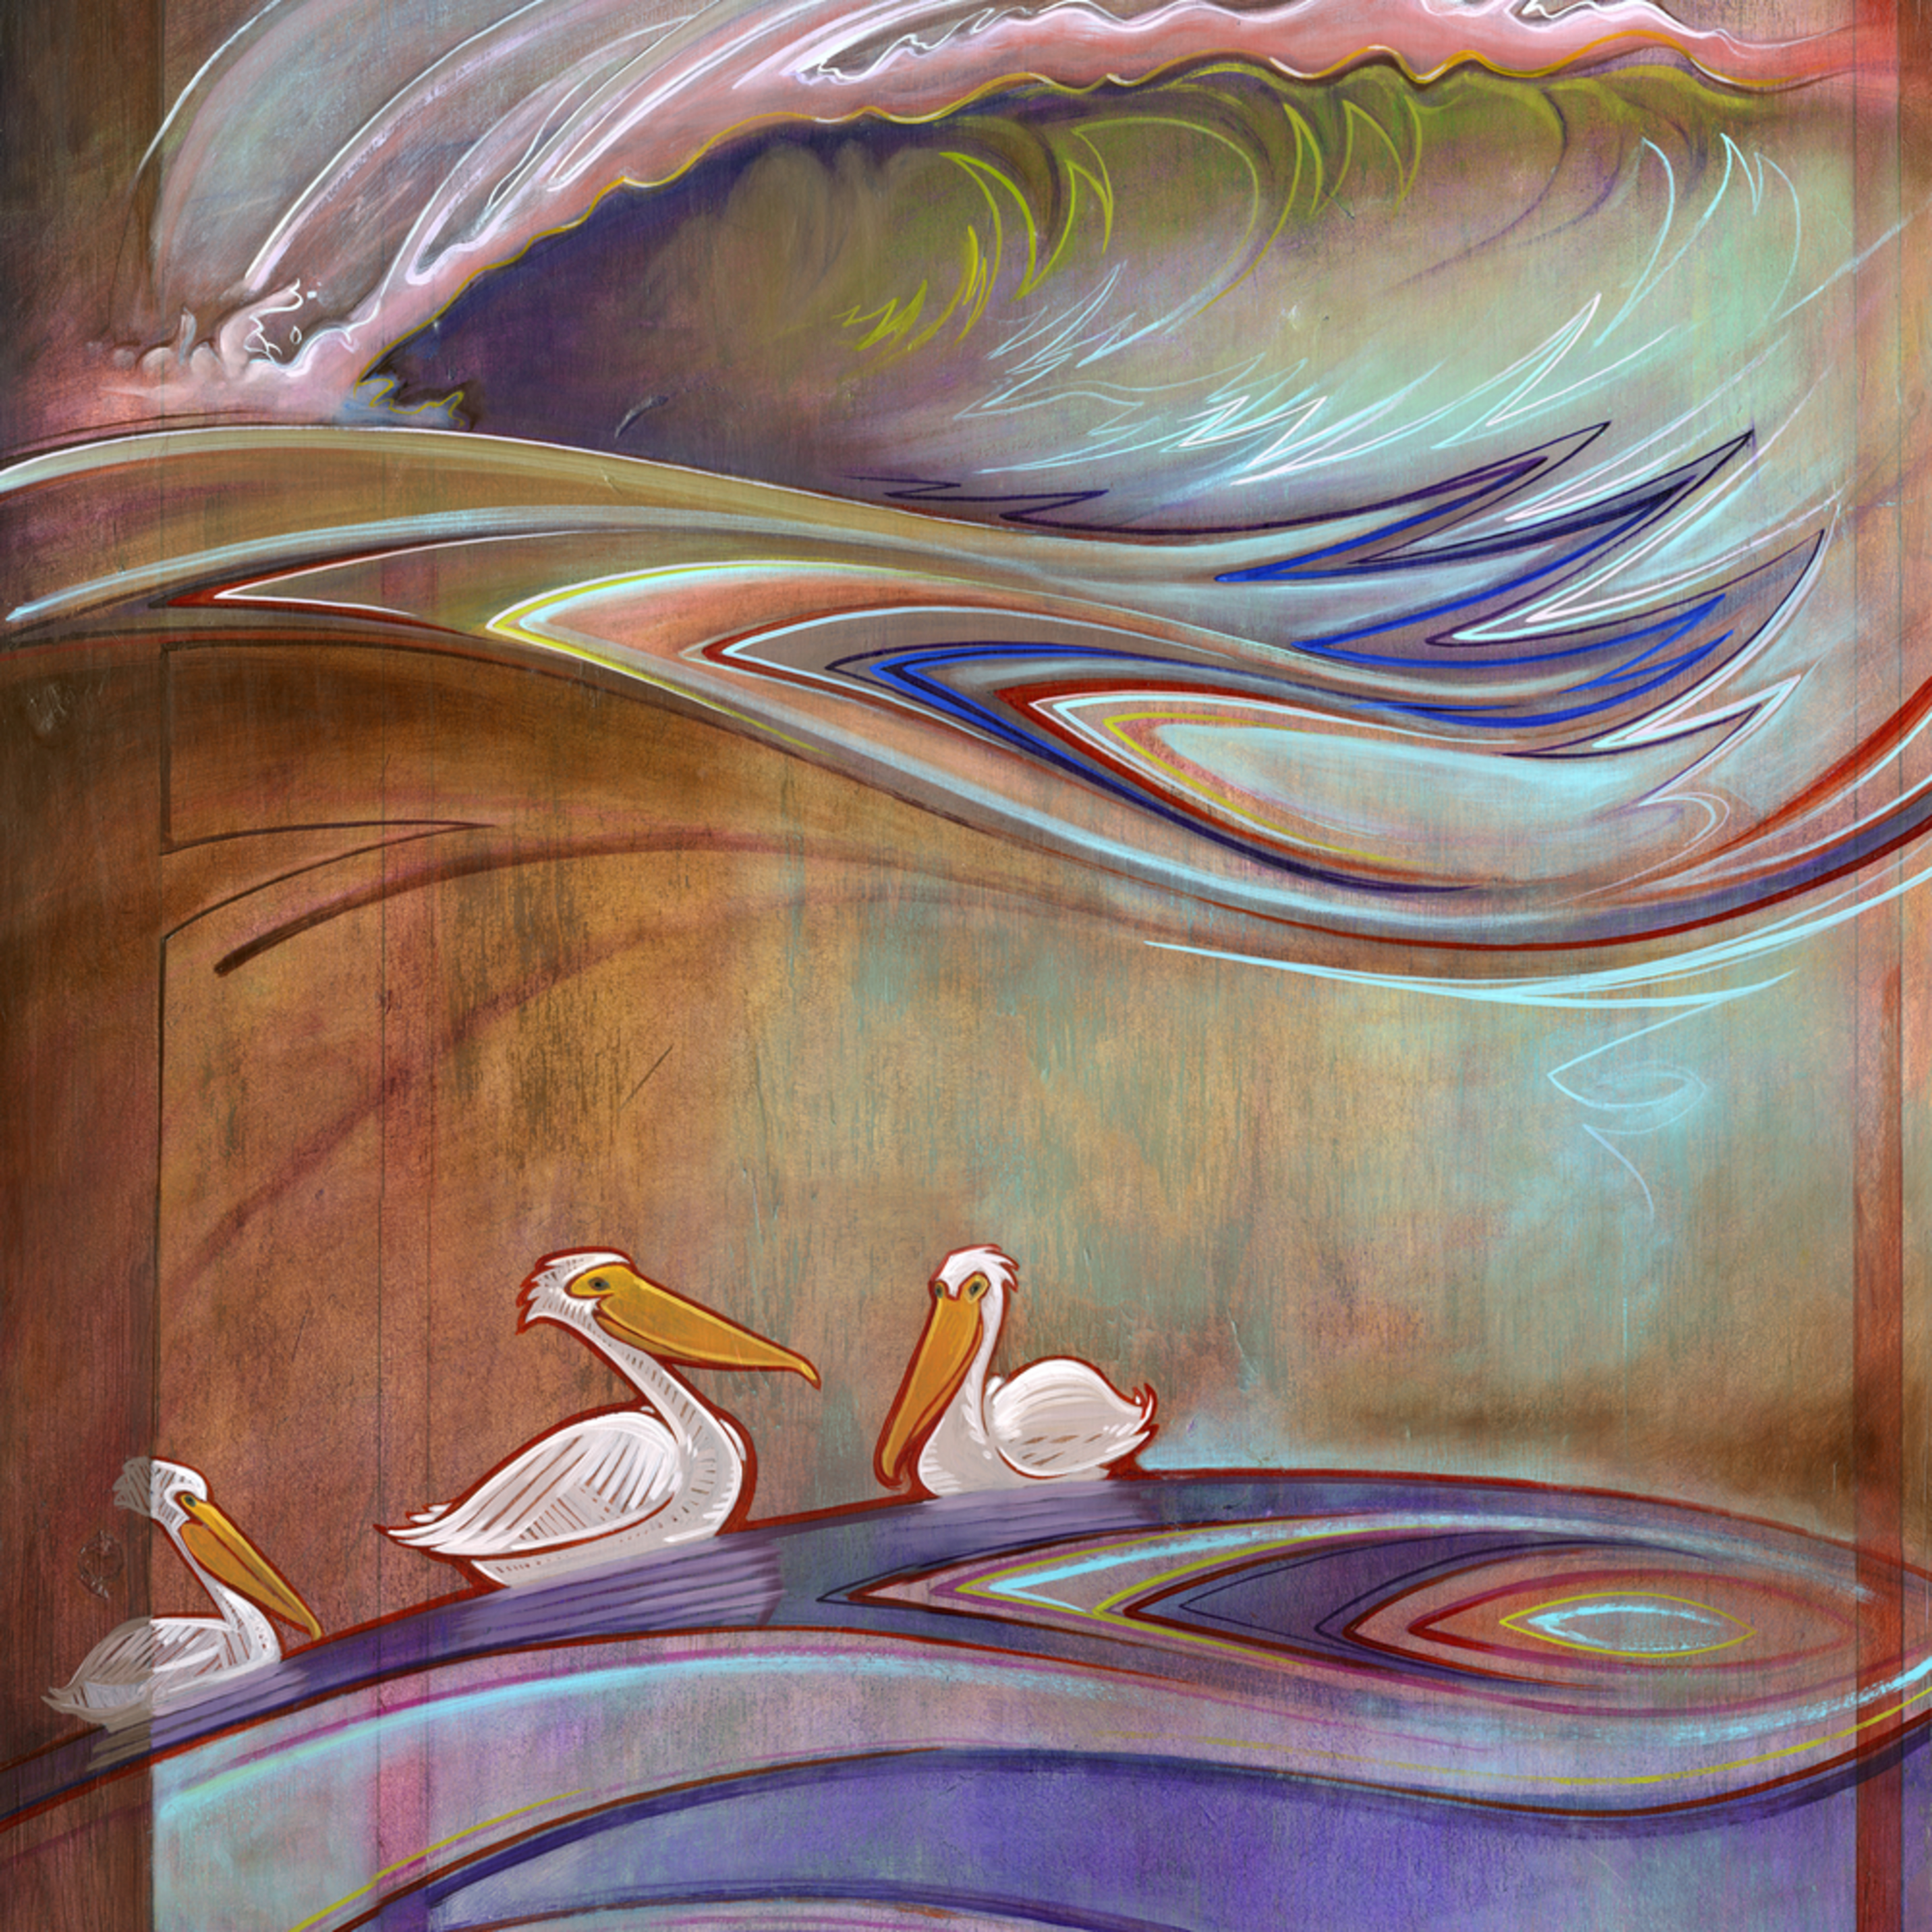 Three pelicans fatecd